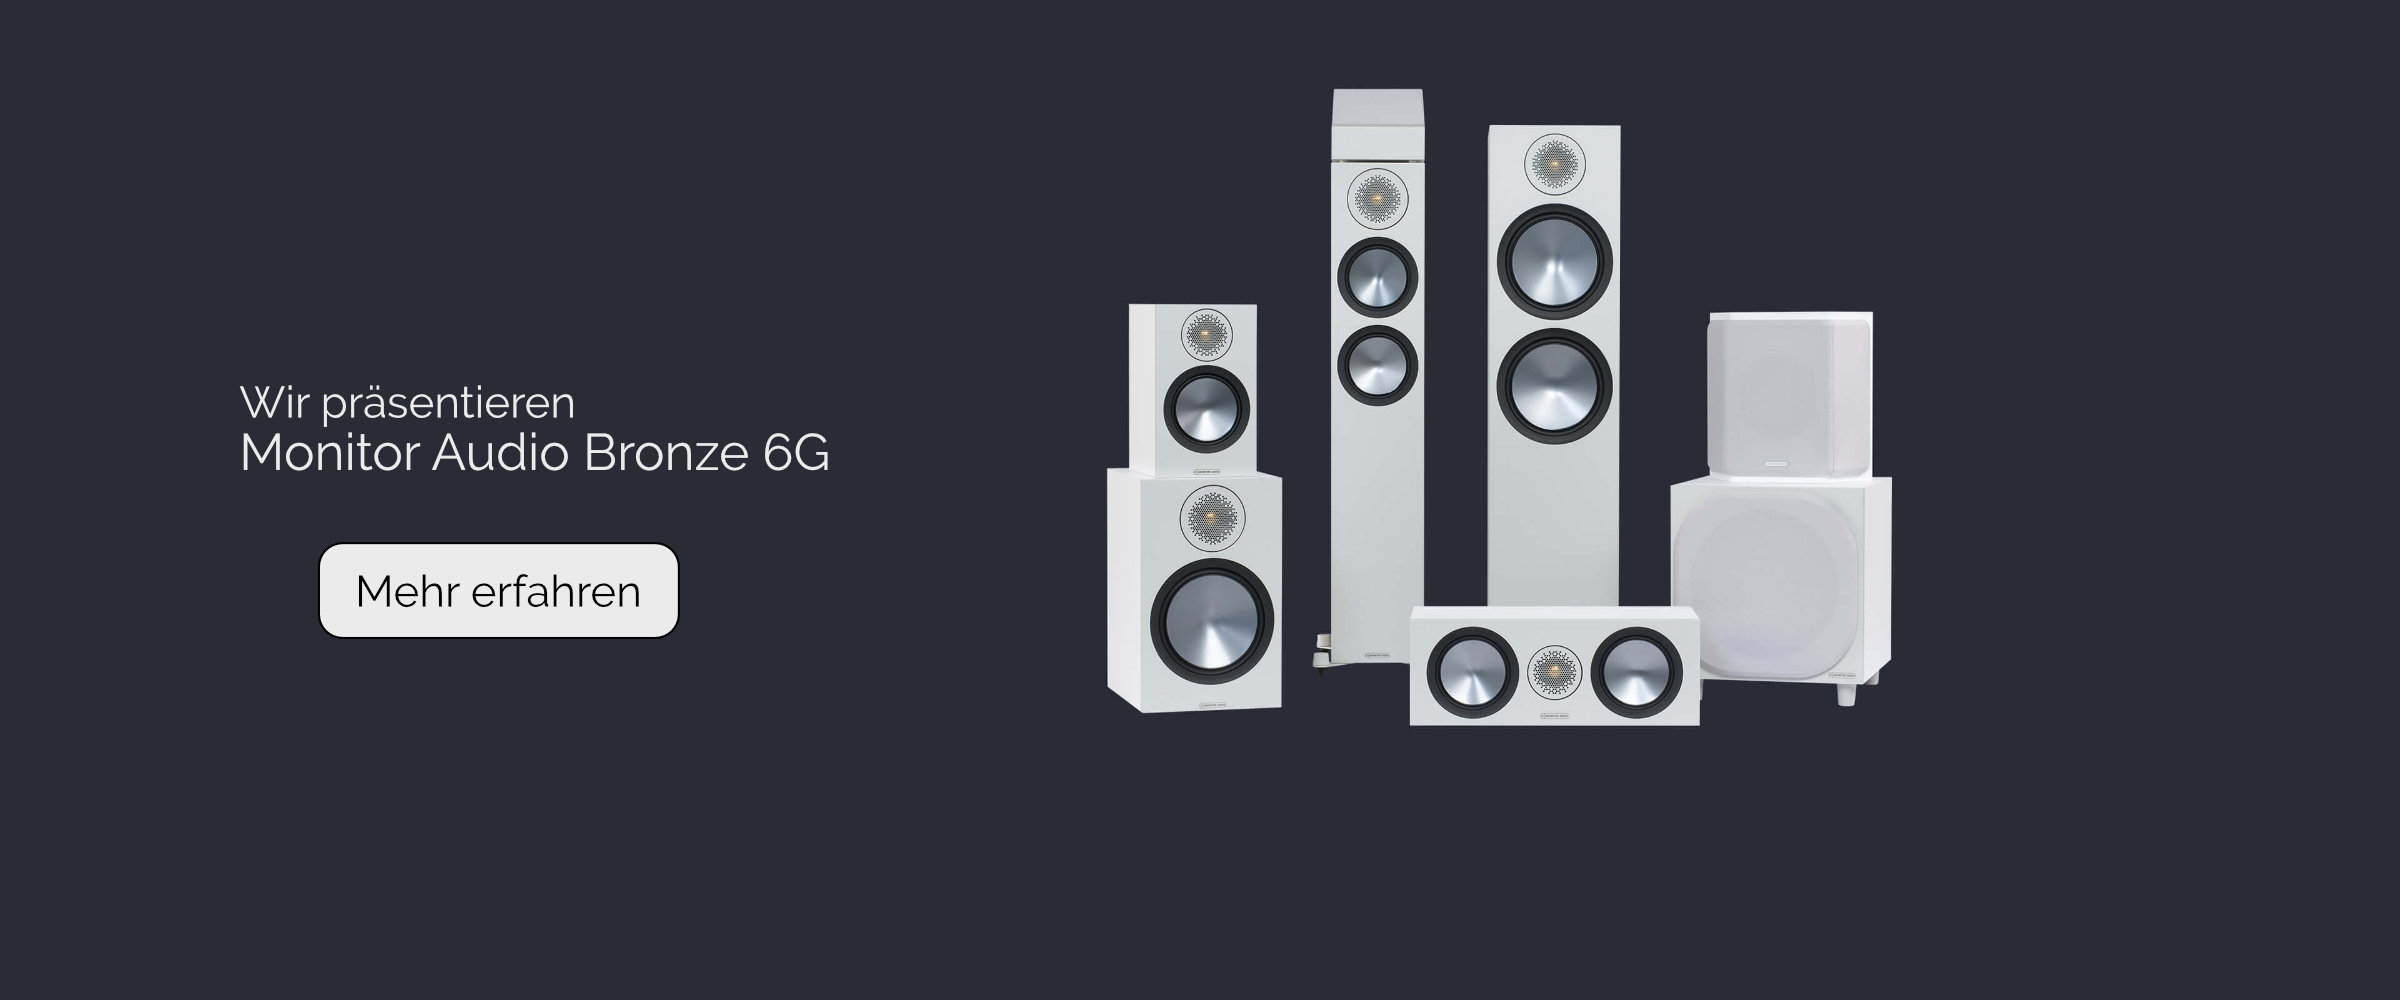 Monitor Audio Bronze 6G-Banner